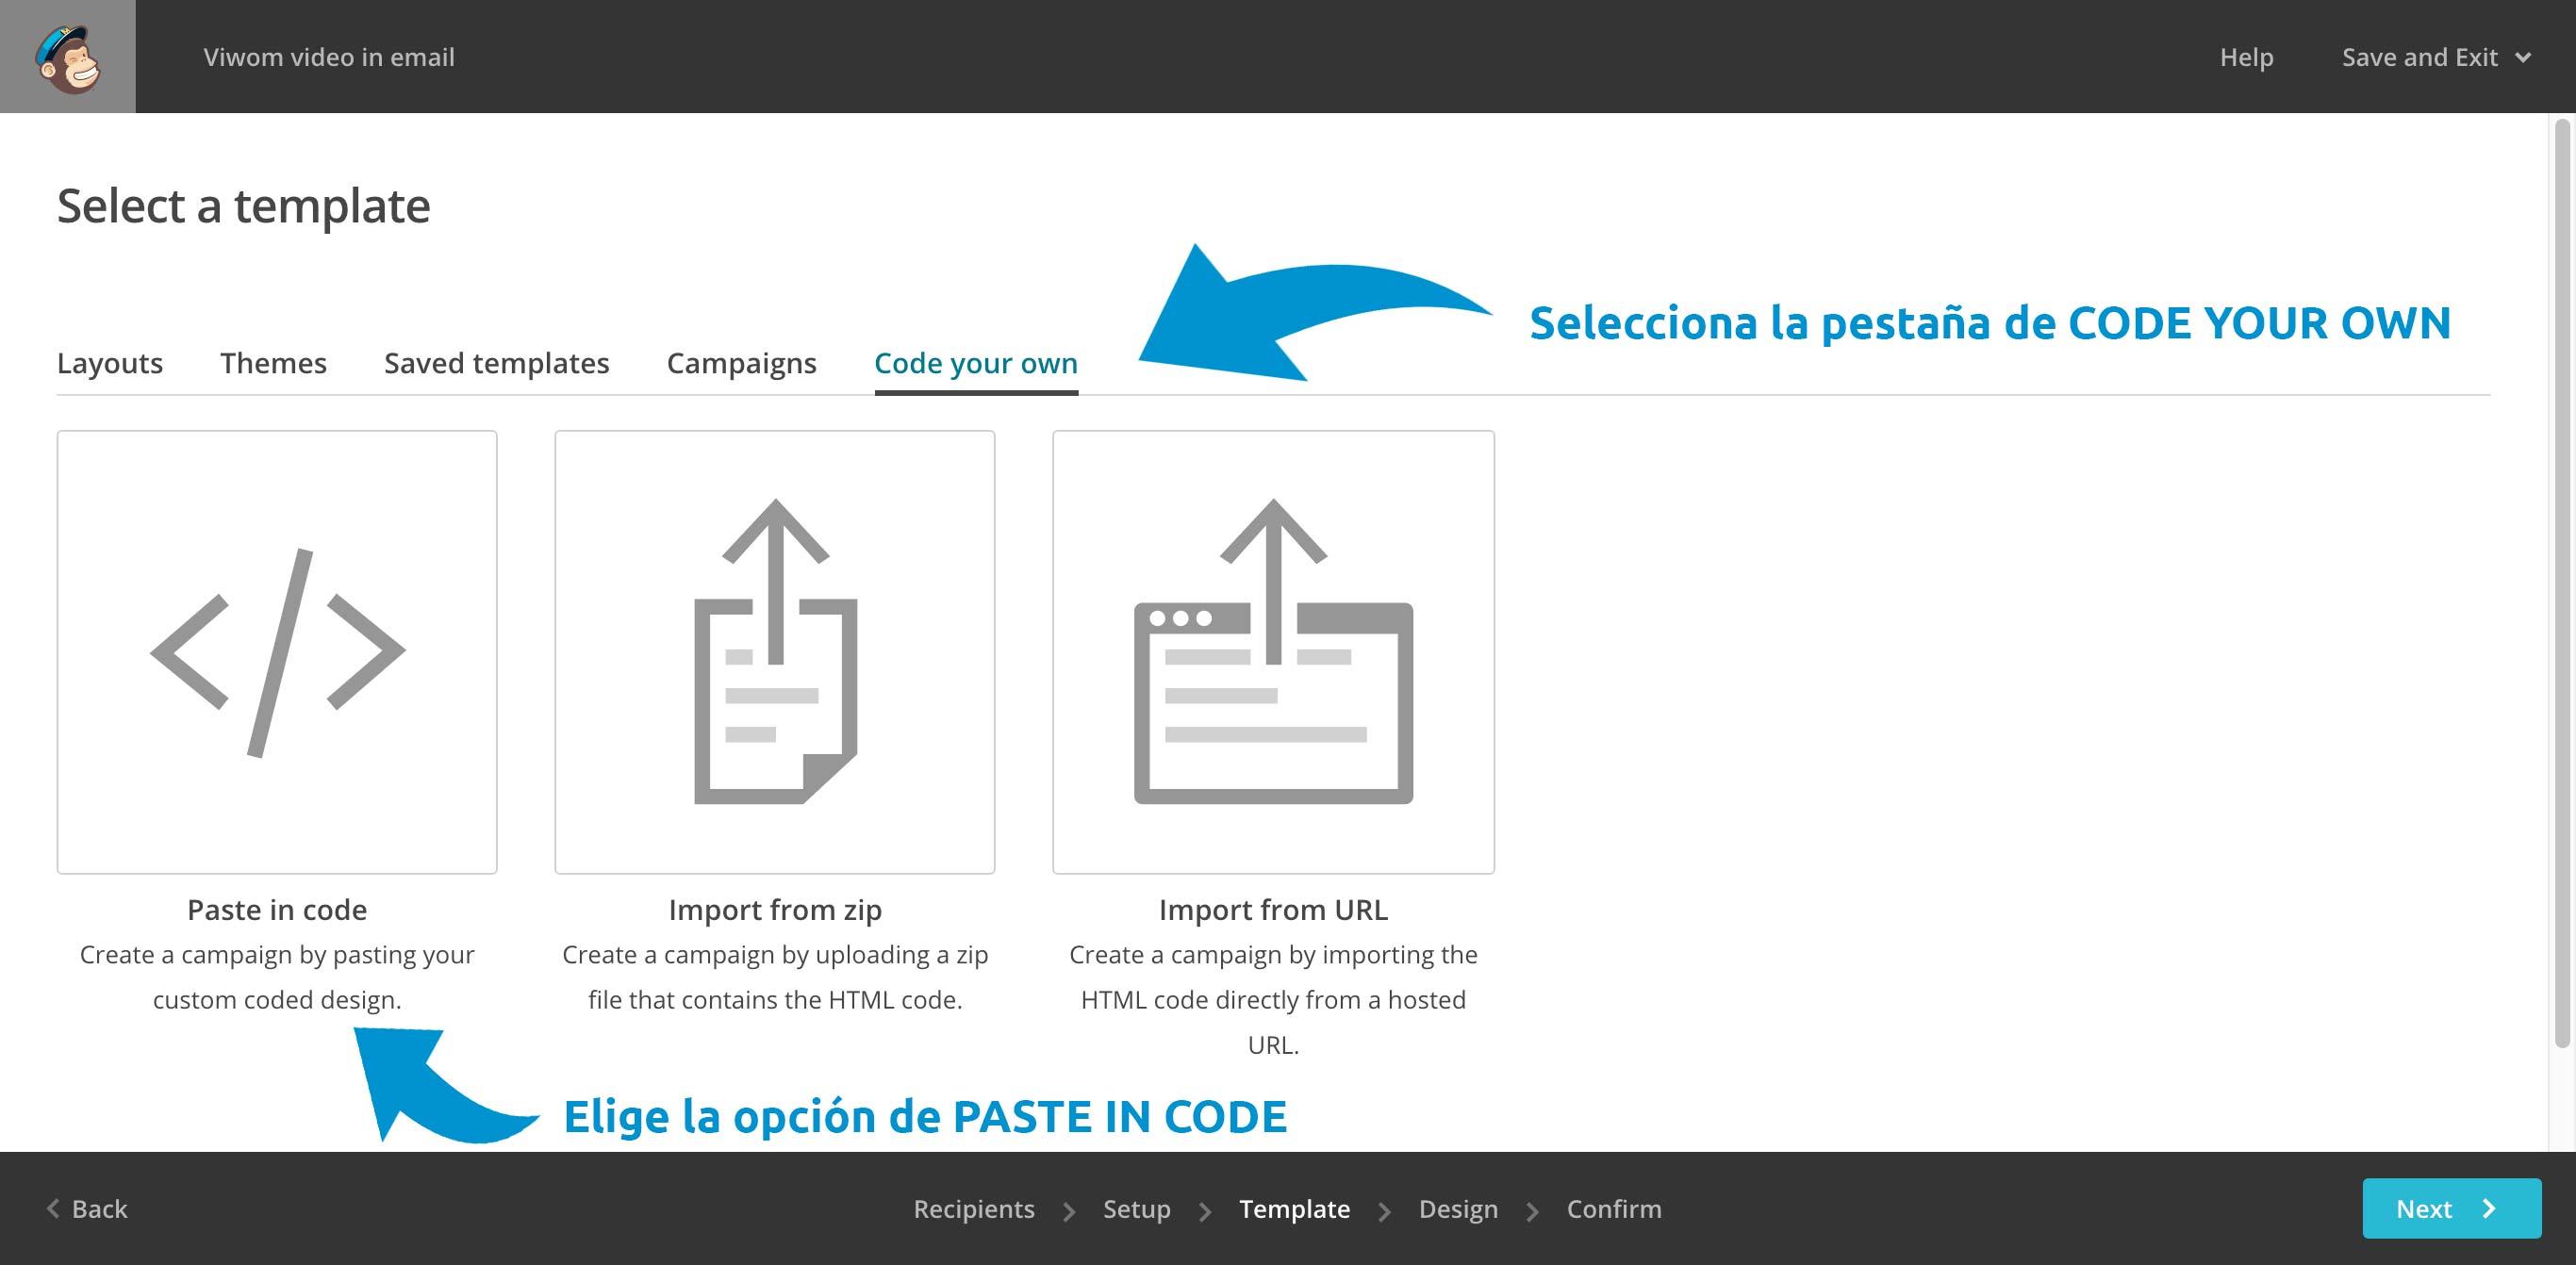 Selecciona code your own y paste in code